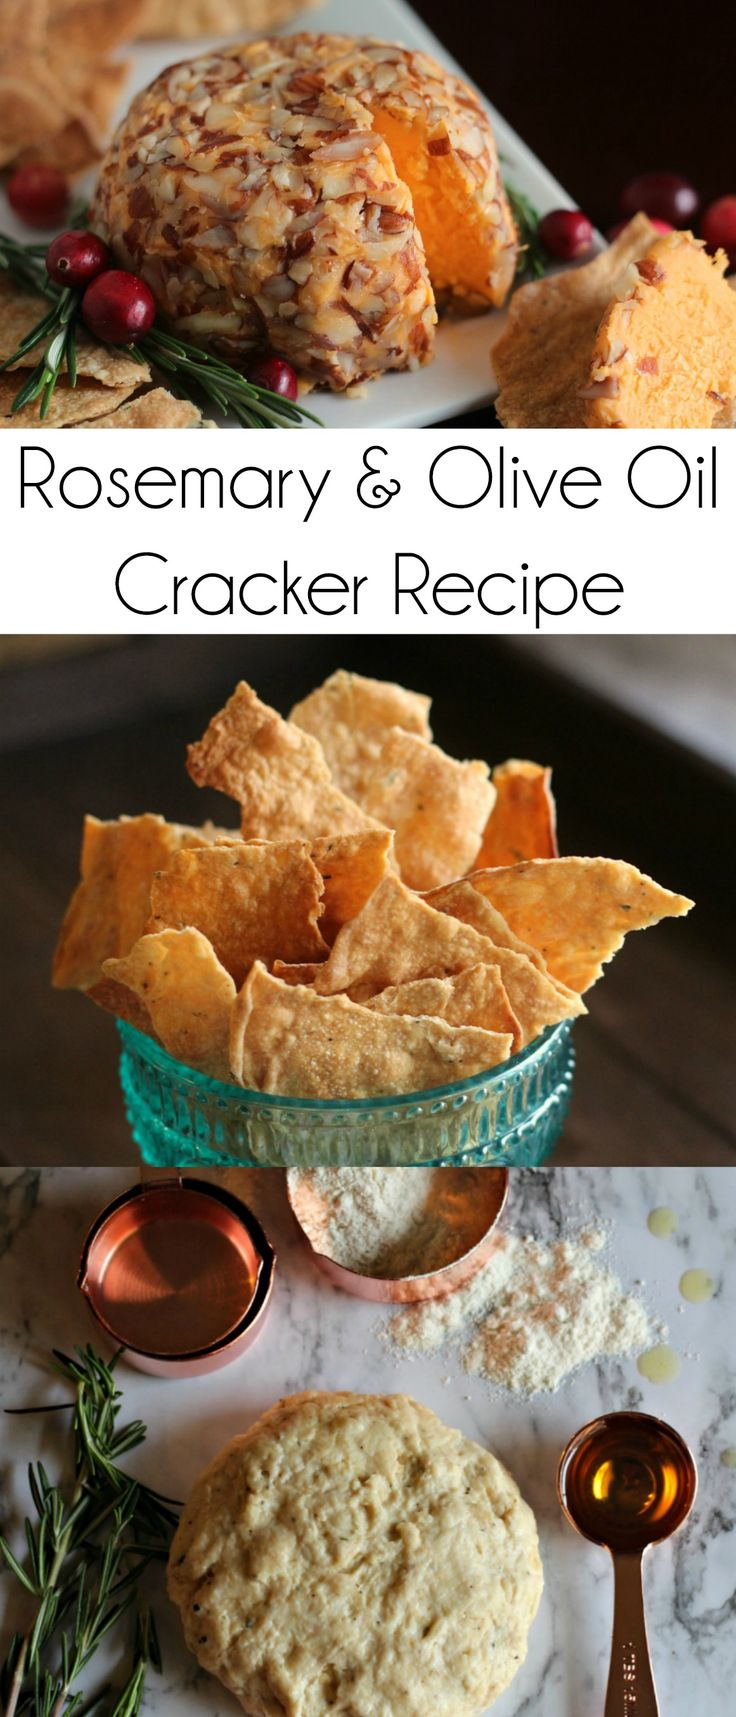 Rosemary and Olive Oil Cracker Recipe | Homemade Crackers | Cheese and Crackers | #InspireWithCheese AD